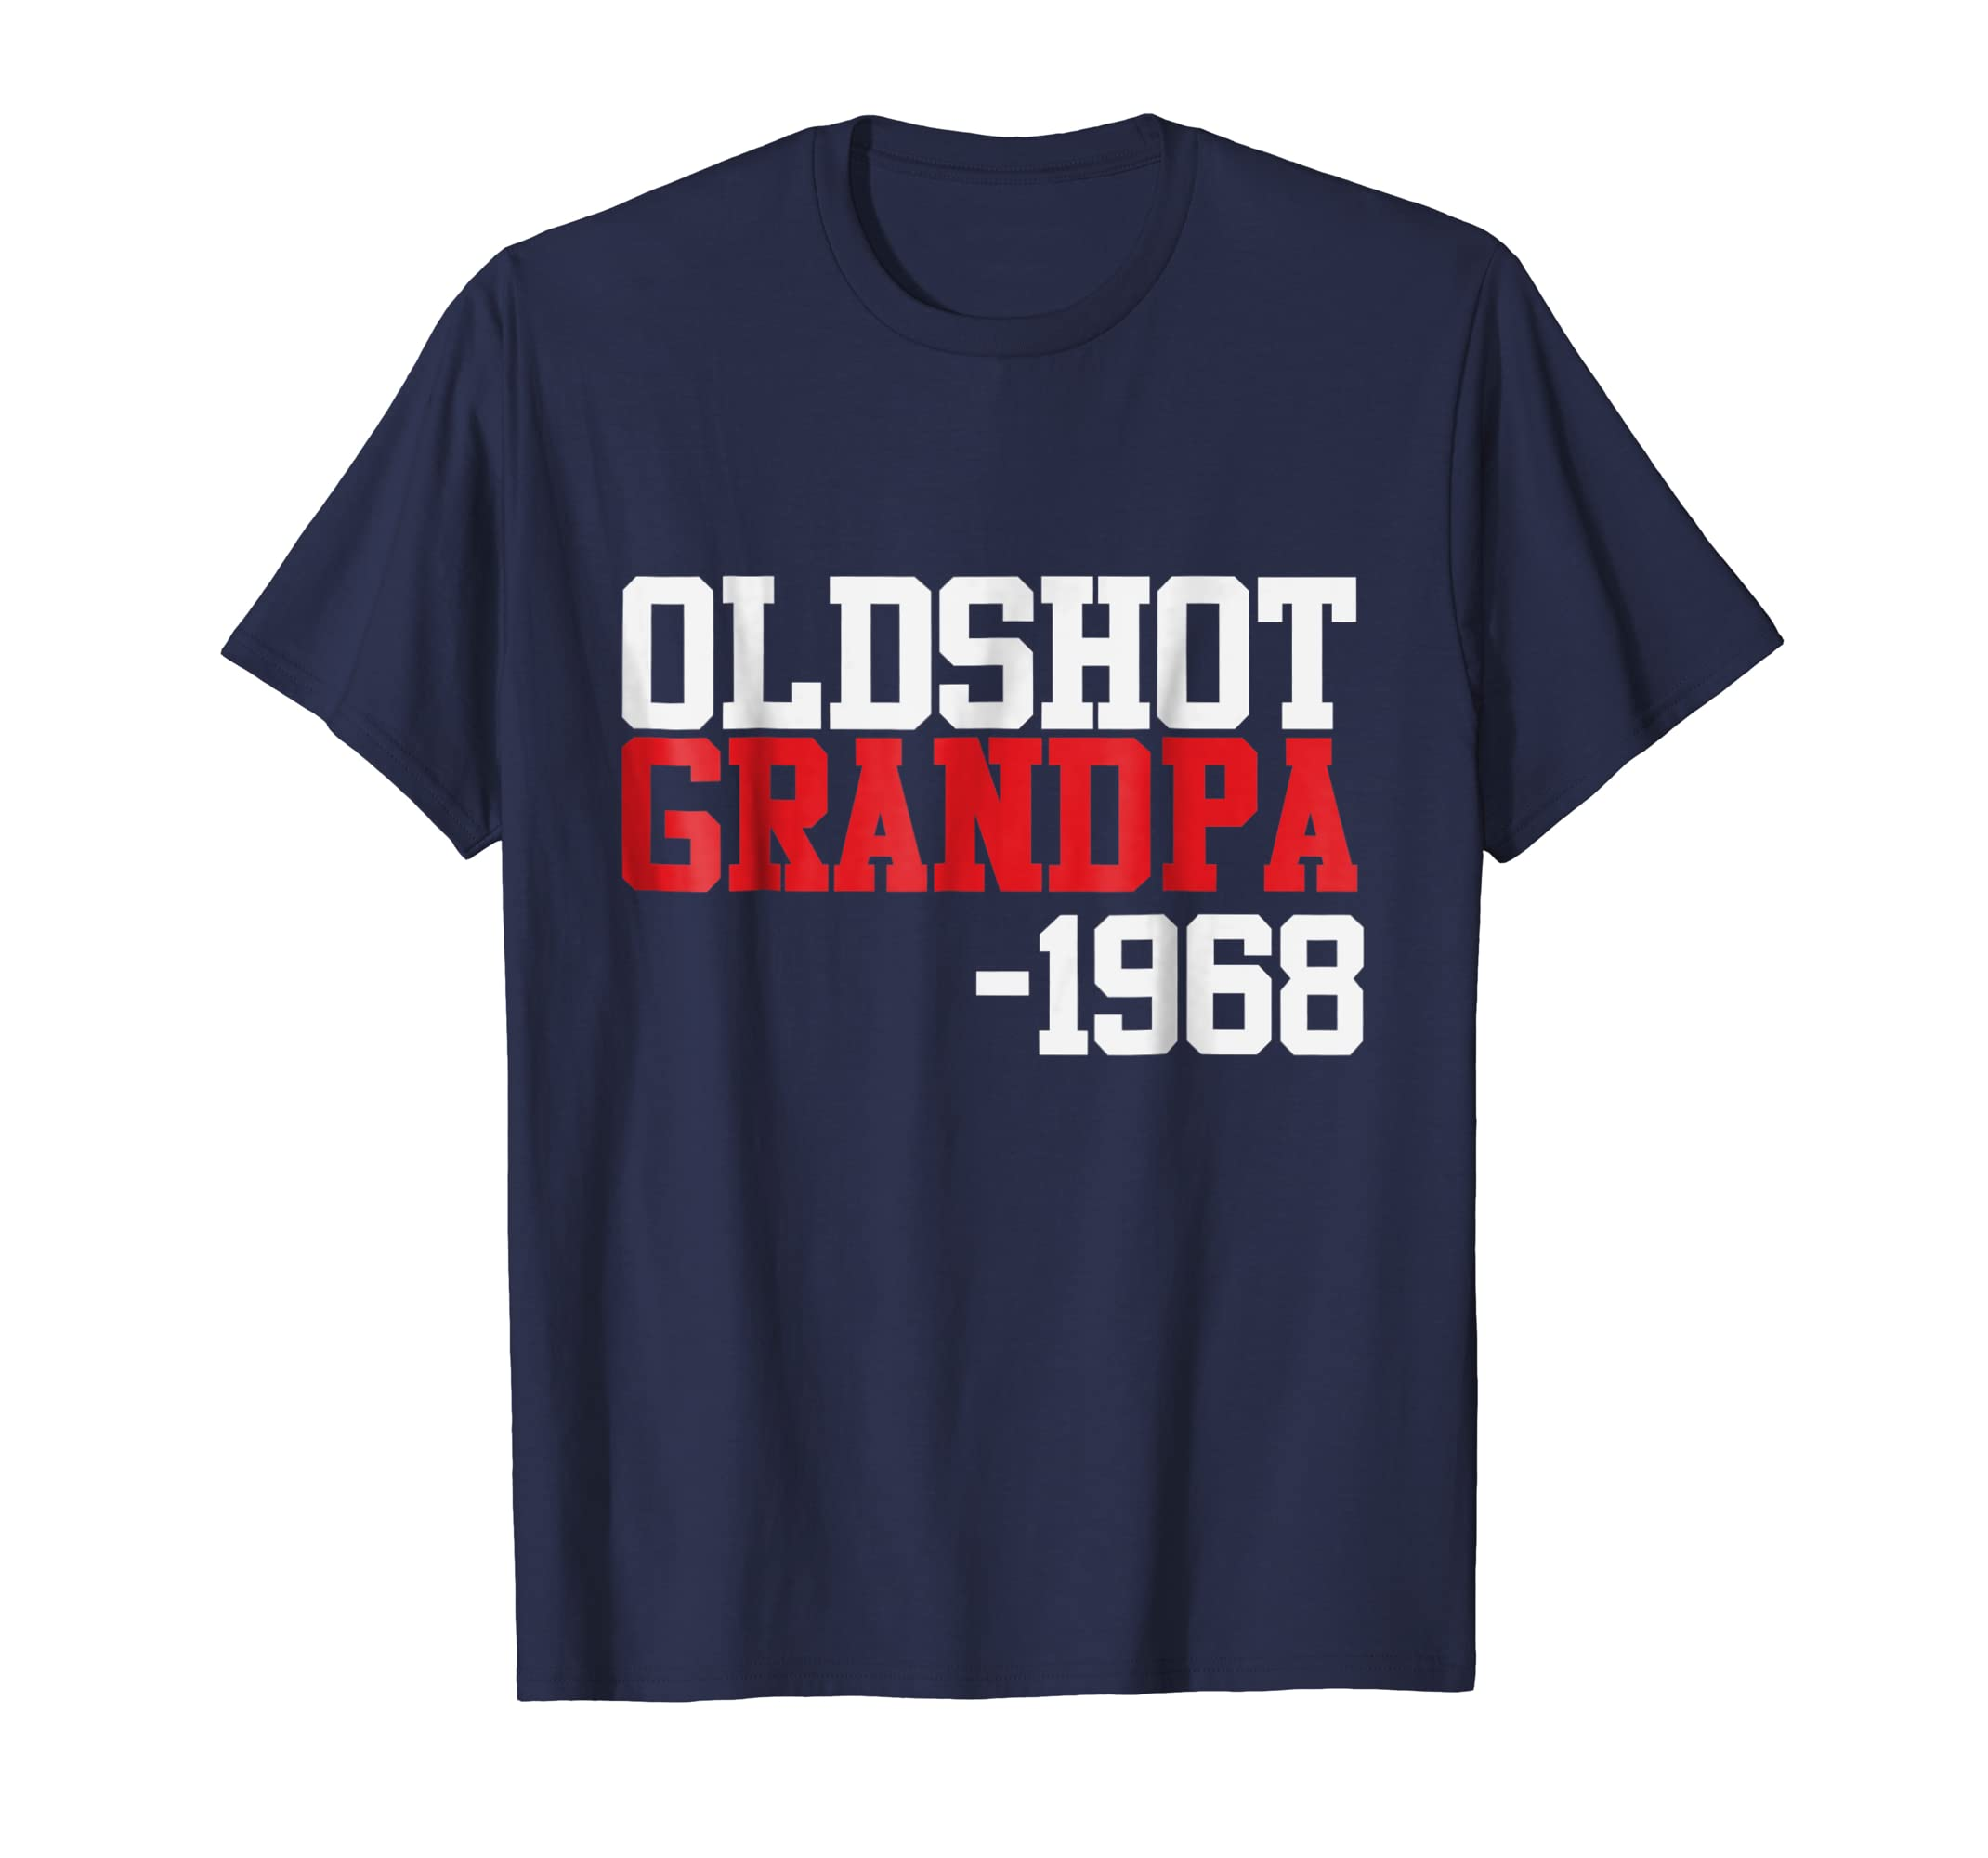 Amazon Mens Vintage 1968 Cool 50th Birthday Gift Ideas For Grandpa Shirt Clothing